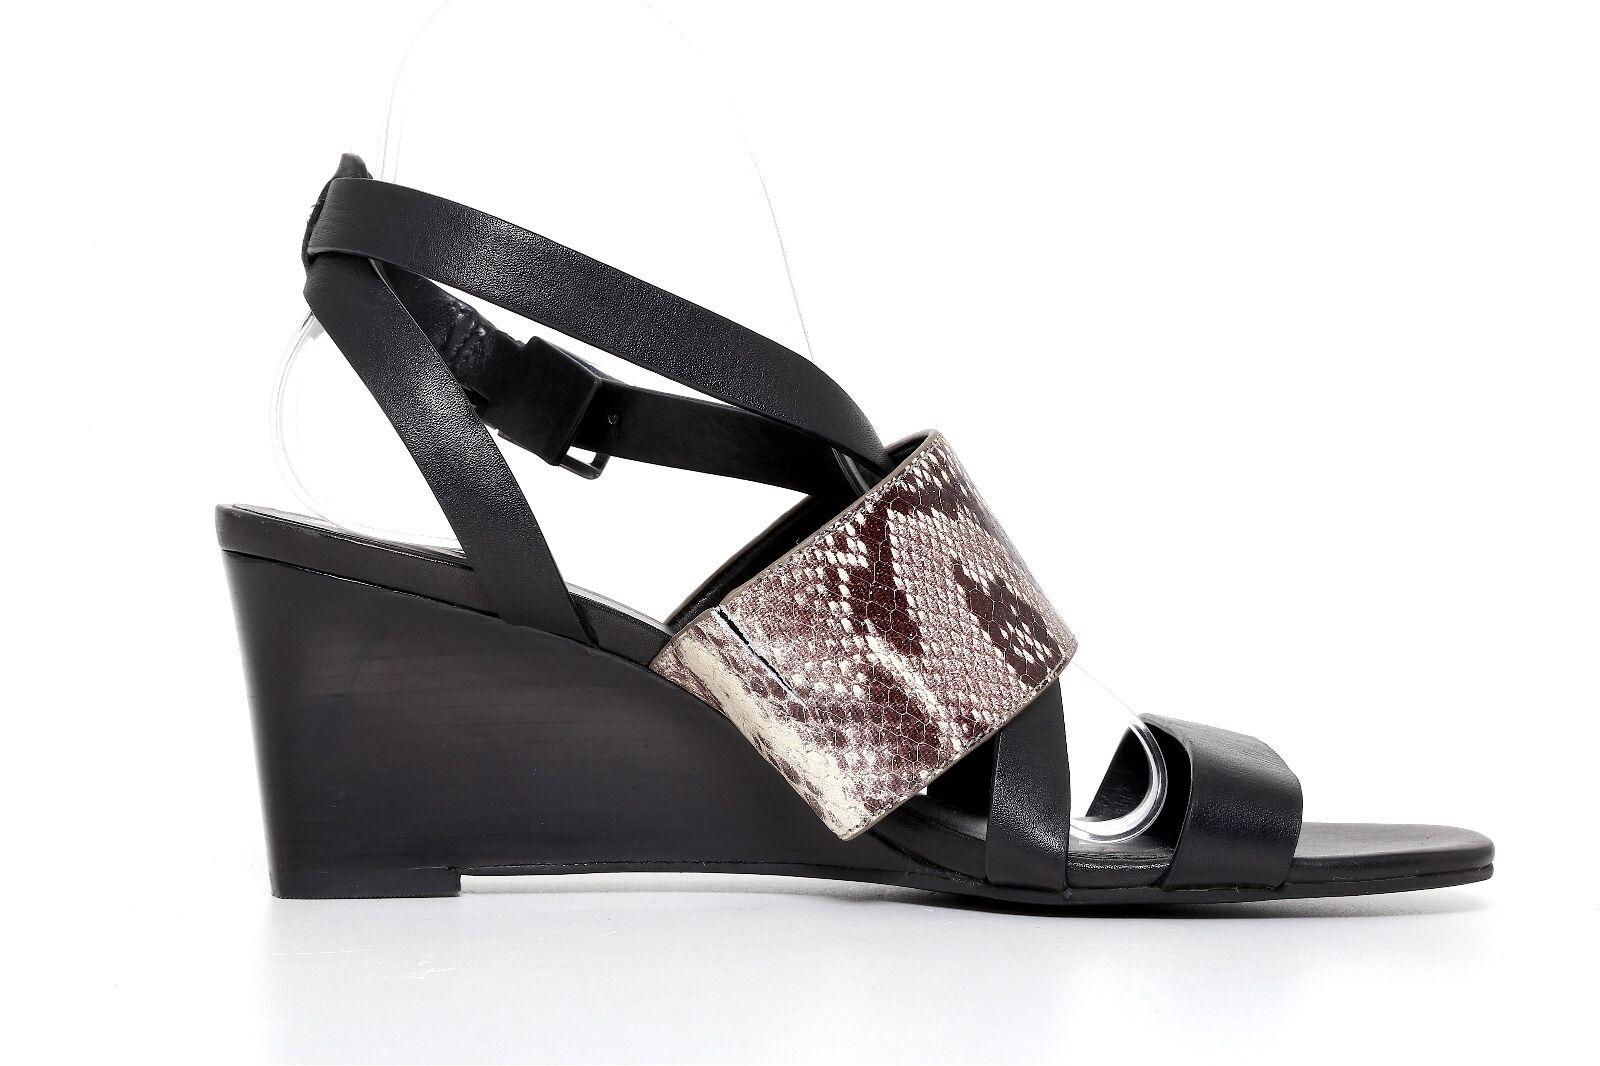 Cole Haan Women's Women's Women's Helena Snake Embossed Leather Wedge Sandal Size 9.5 B 1185 61bf89